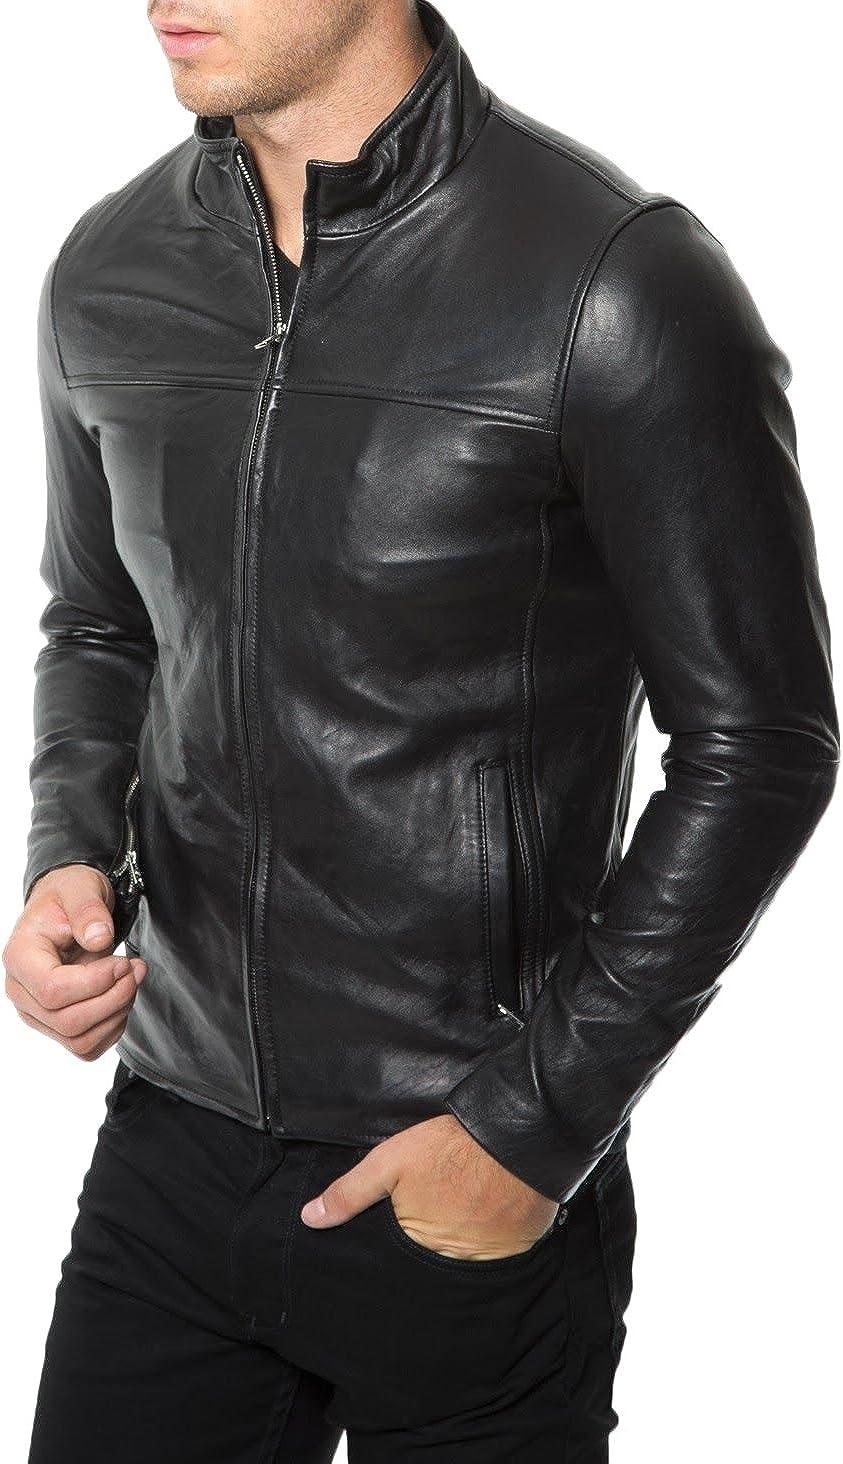 Kingdom Leather Mens Leather Jacket Slim Fit Biker Motorcycle Genuine Lambskin Jacket Coat X1469